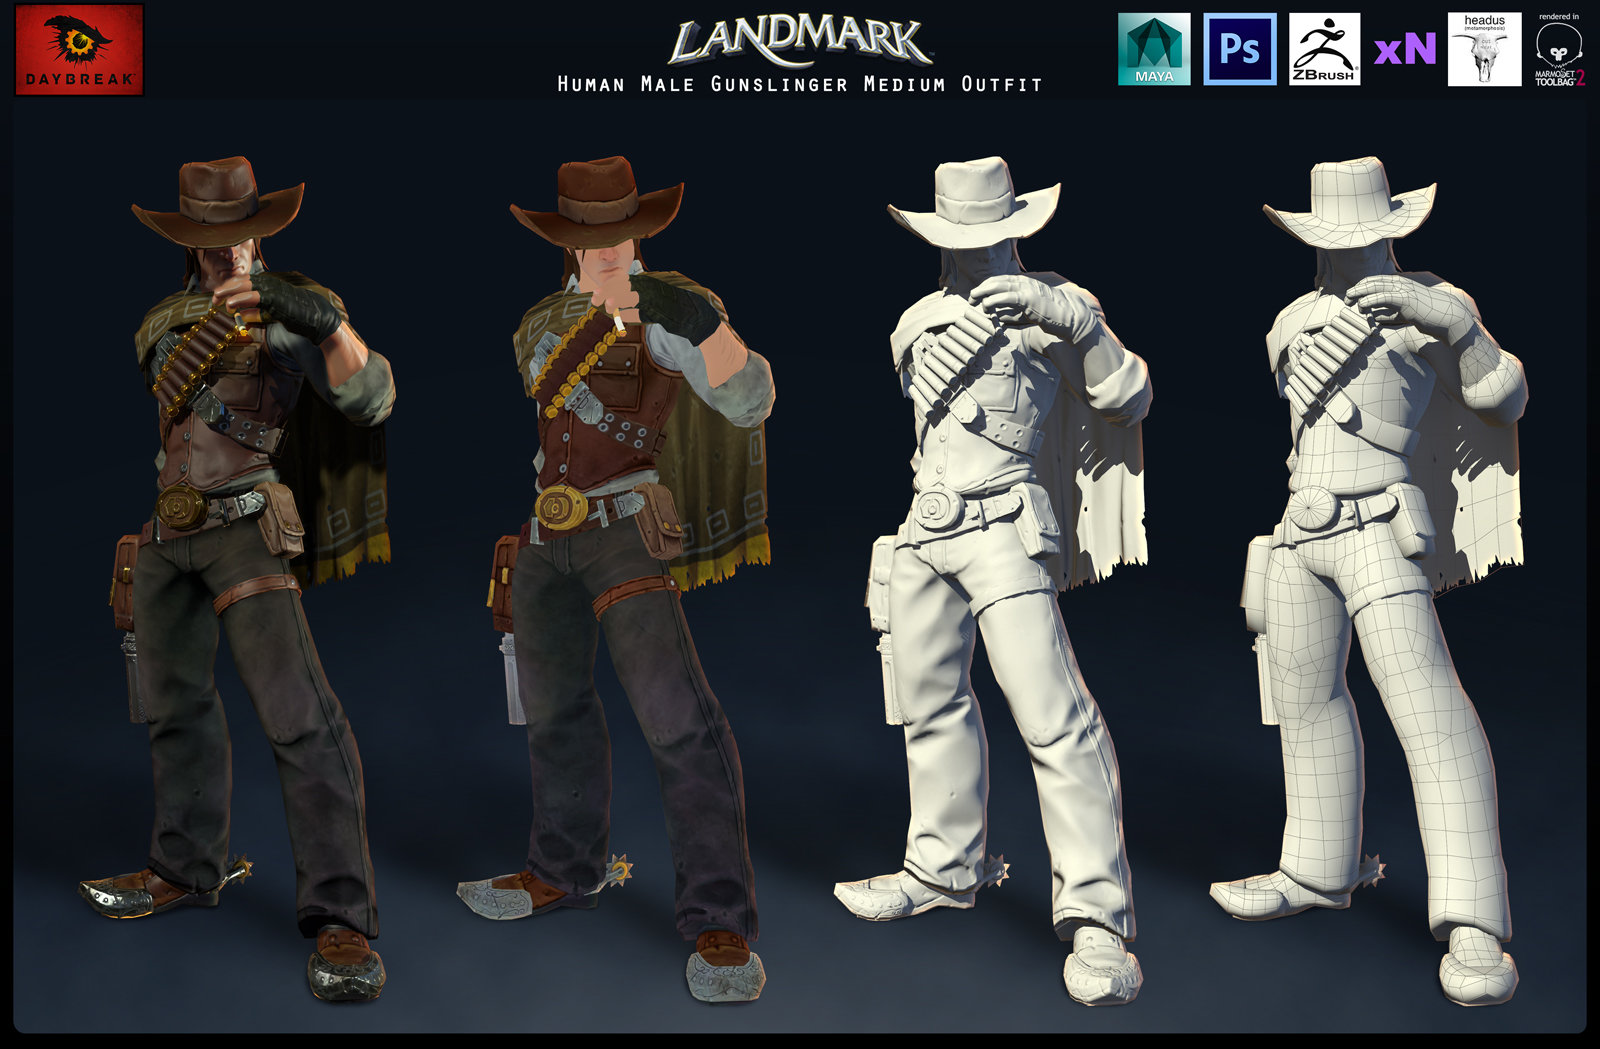 satoshi-arakawa-male-gunslinger-medium-breakdownjpg1437289601